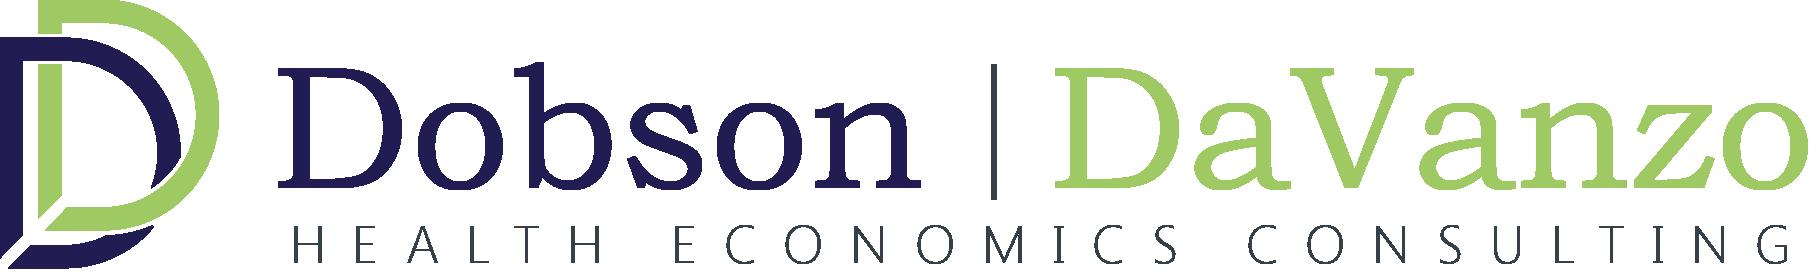 Dobson DaVanzo1.png